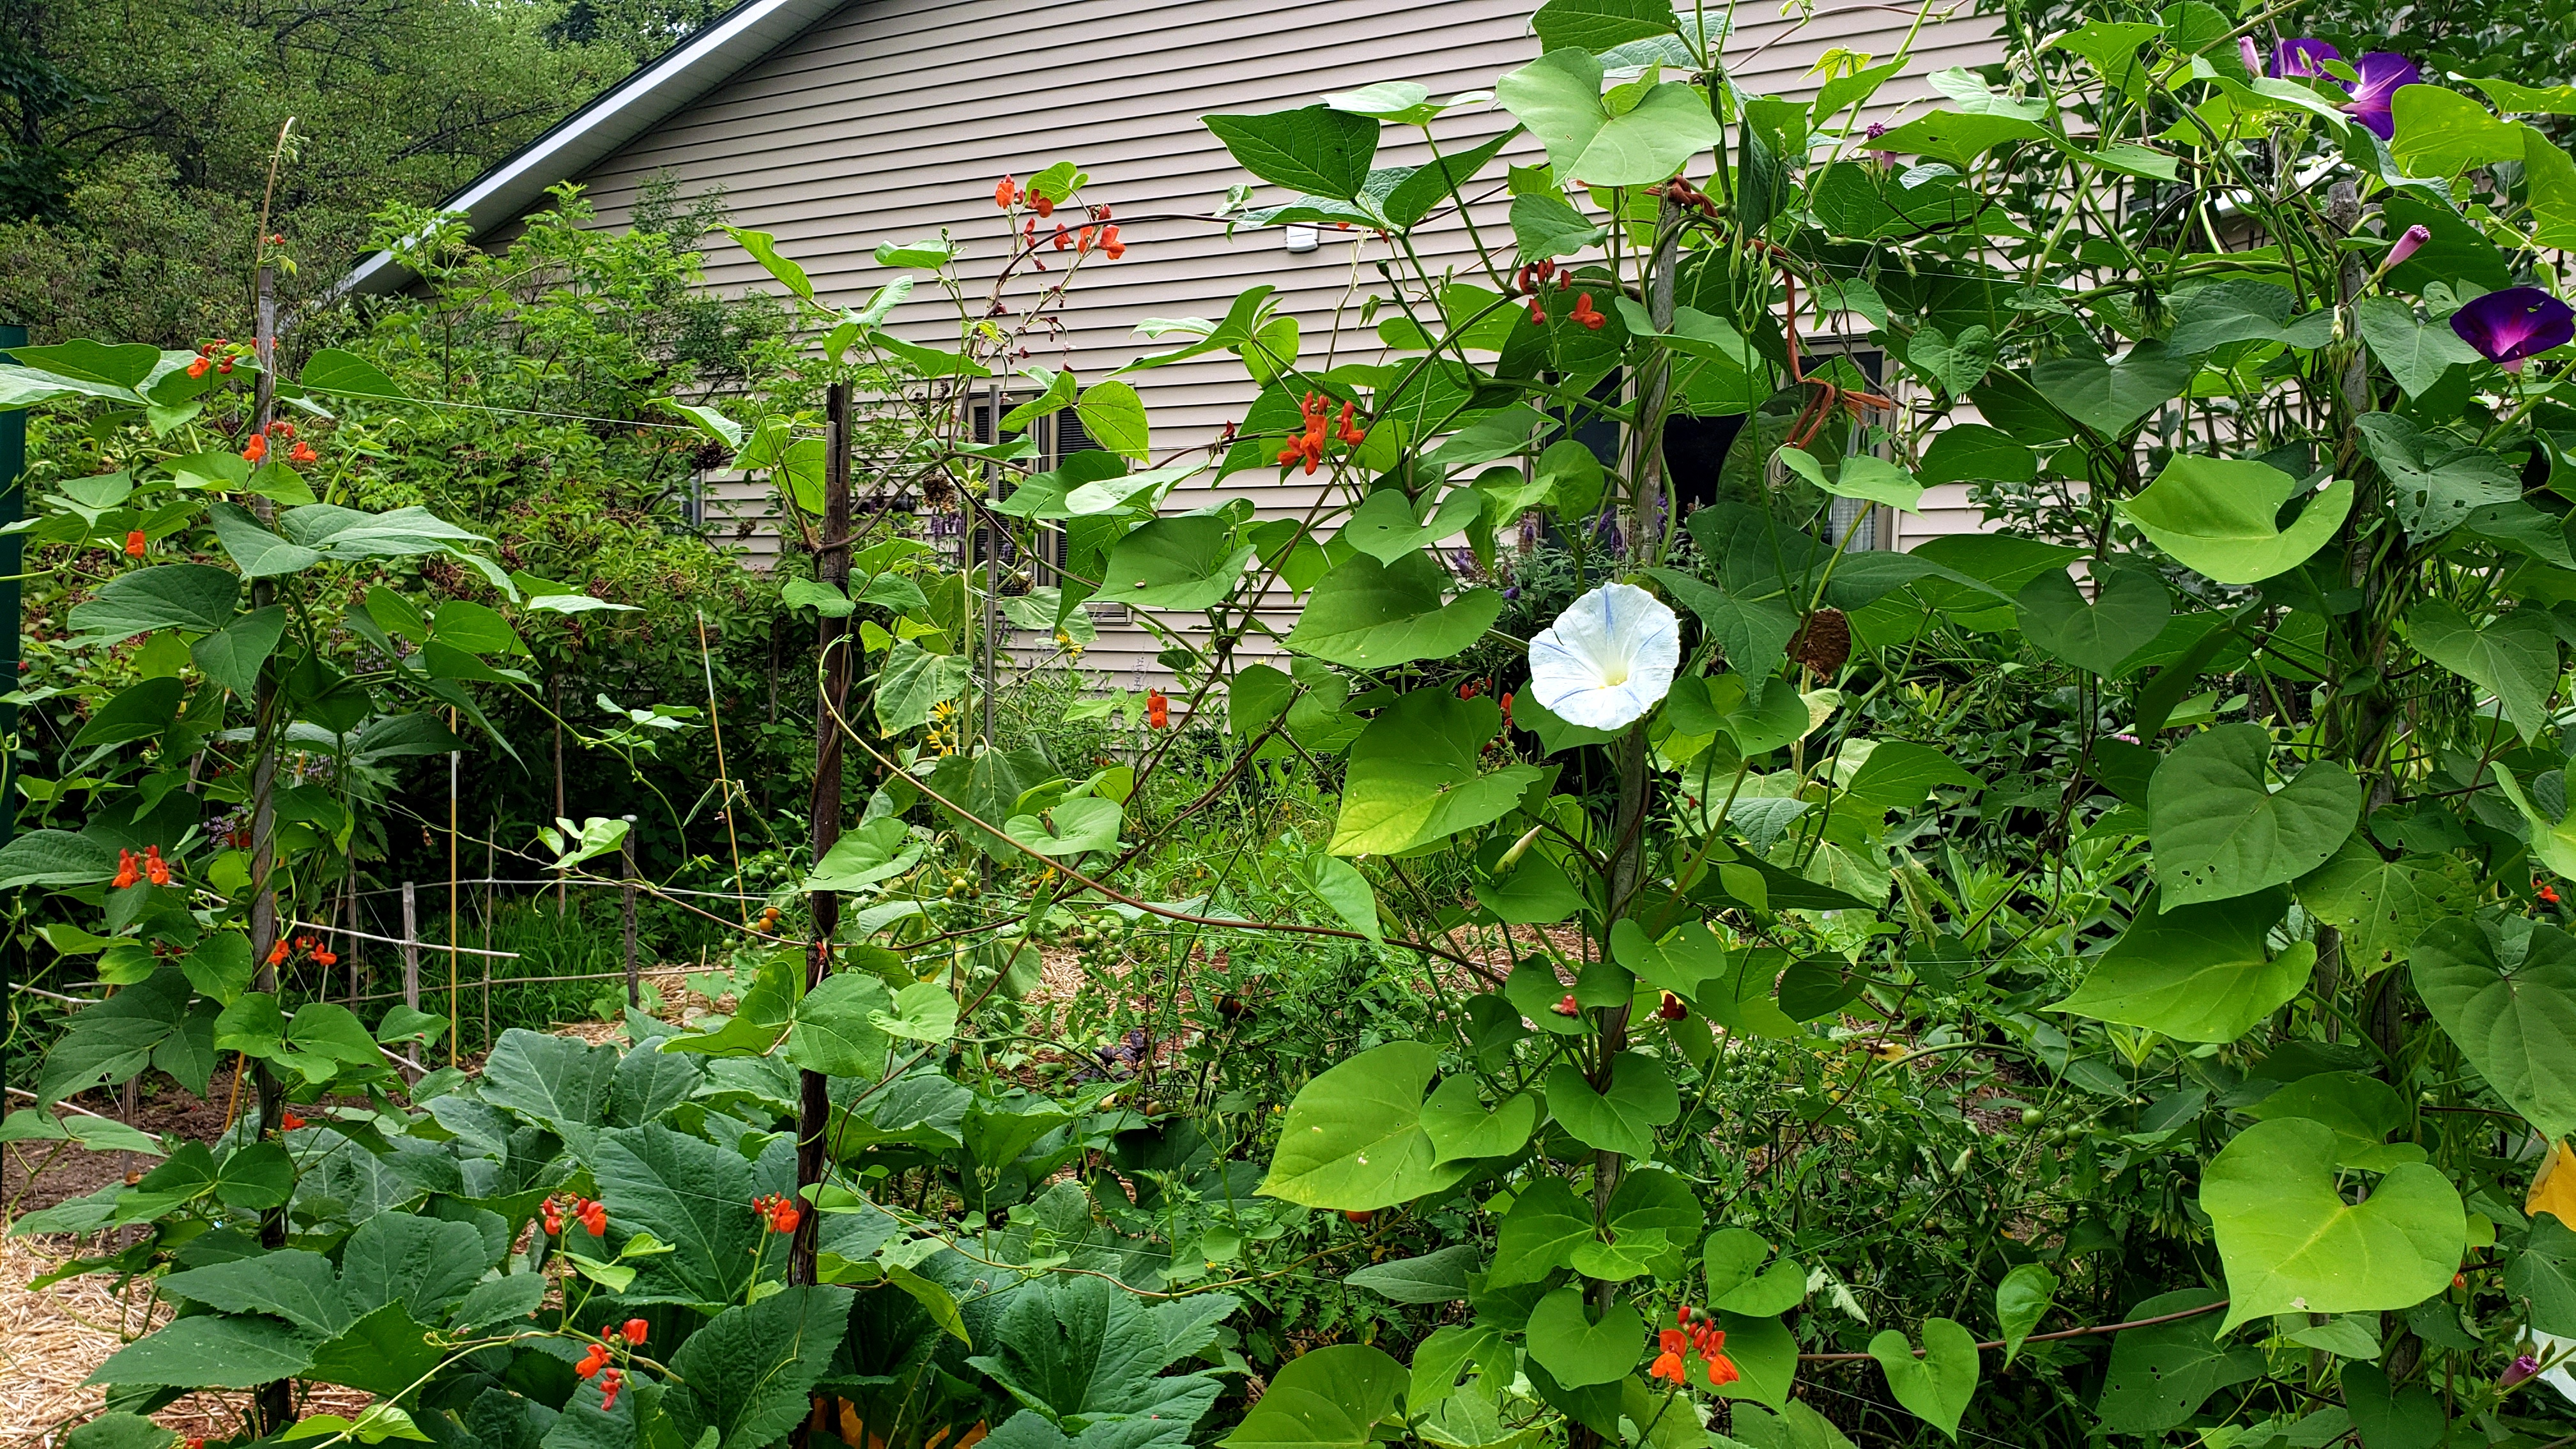 veggardenvinesmorninggloriesscarletrunnerbeansflowers16Aug2020